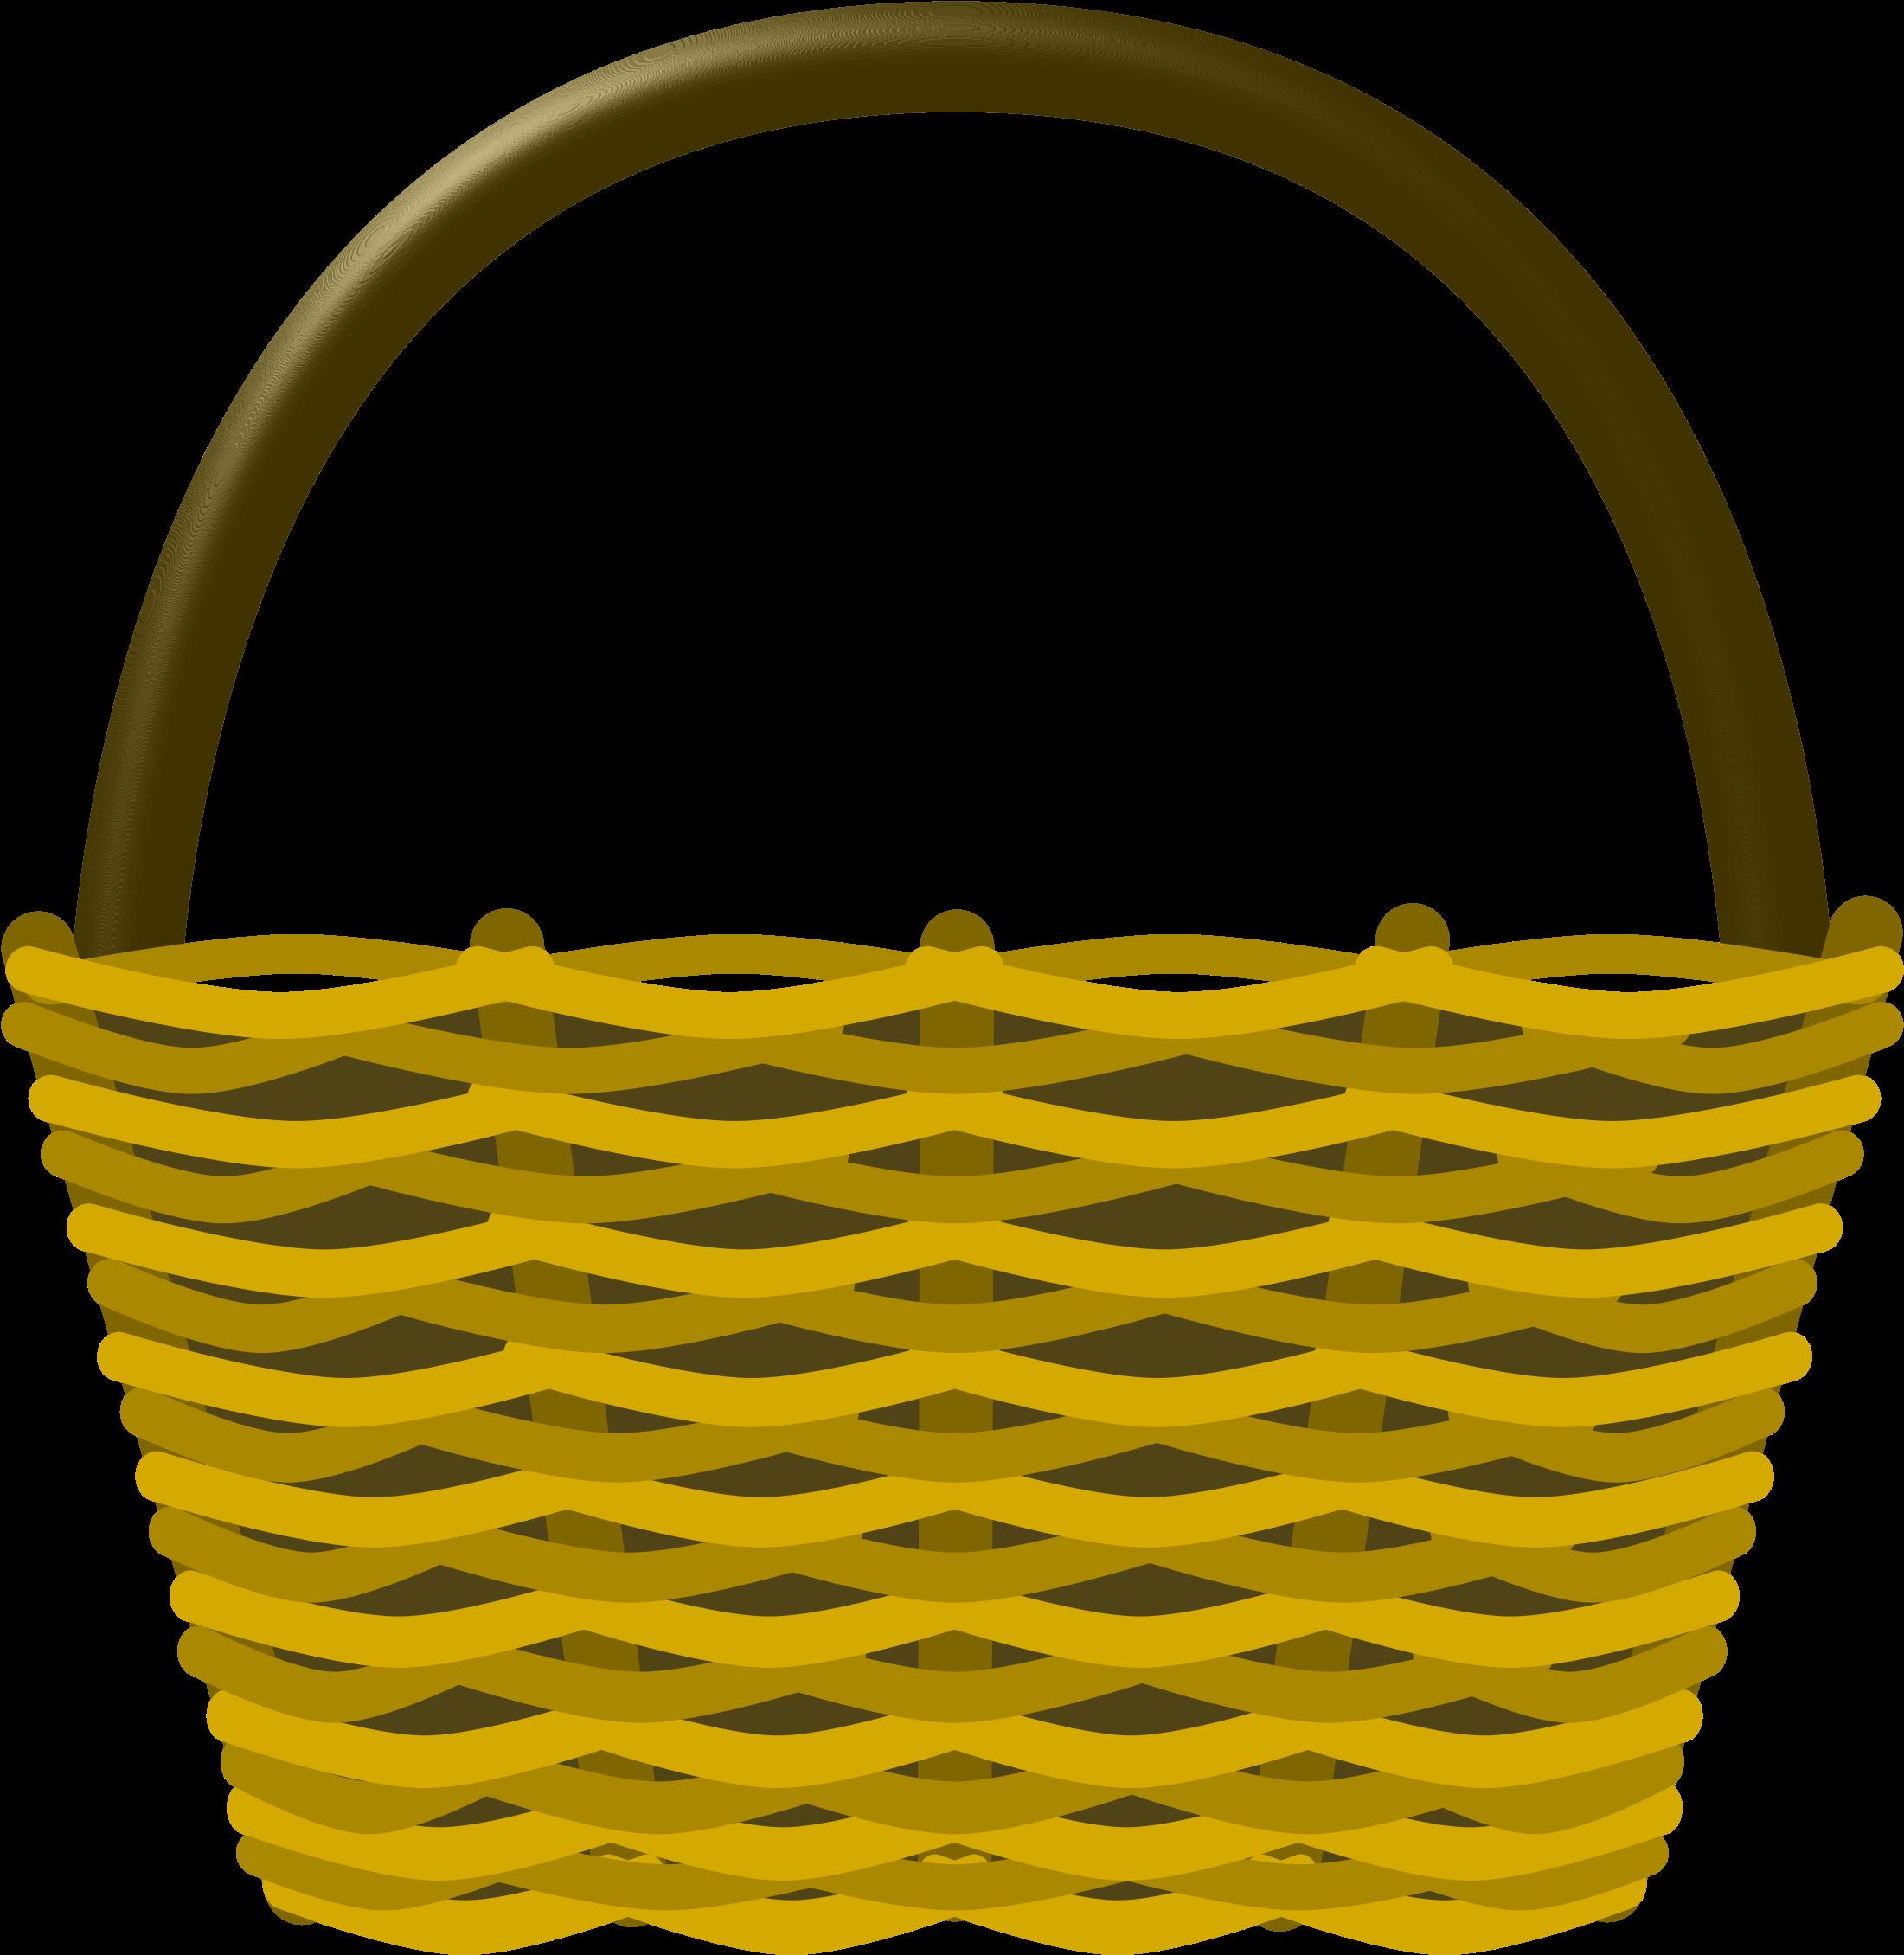 Basket Clipart Tumundografico.